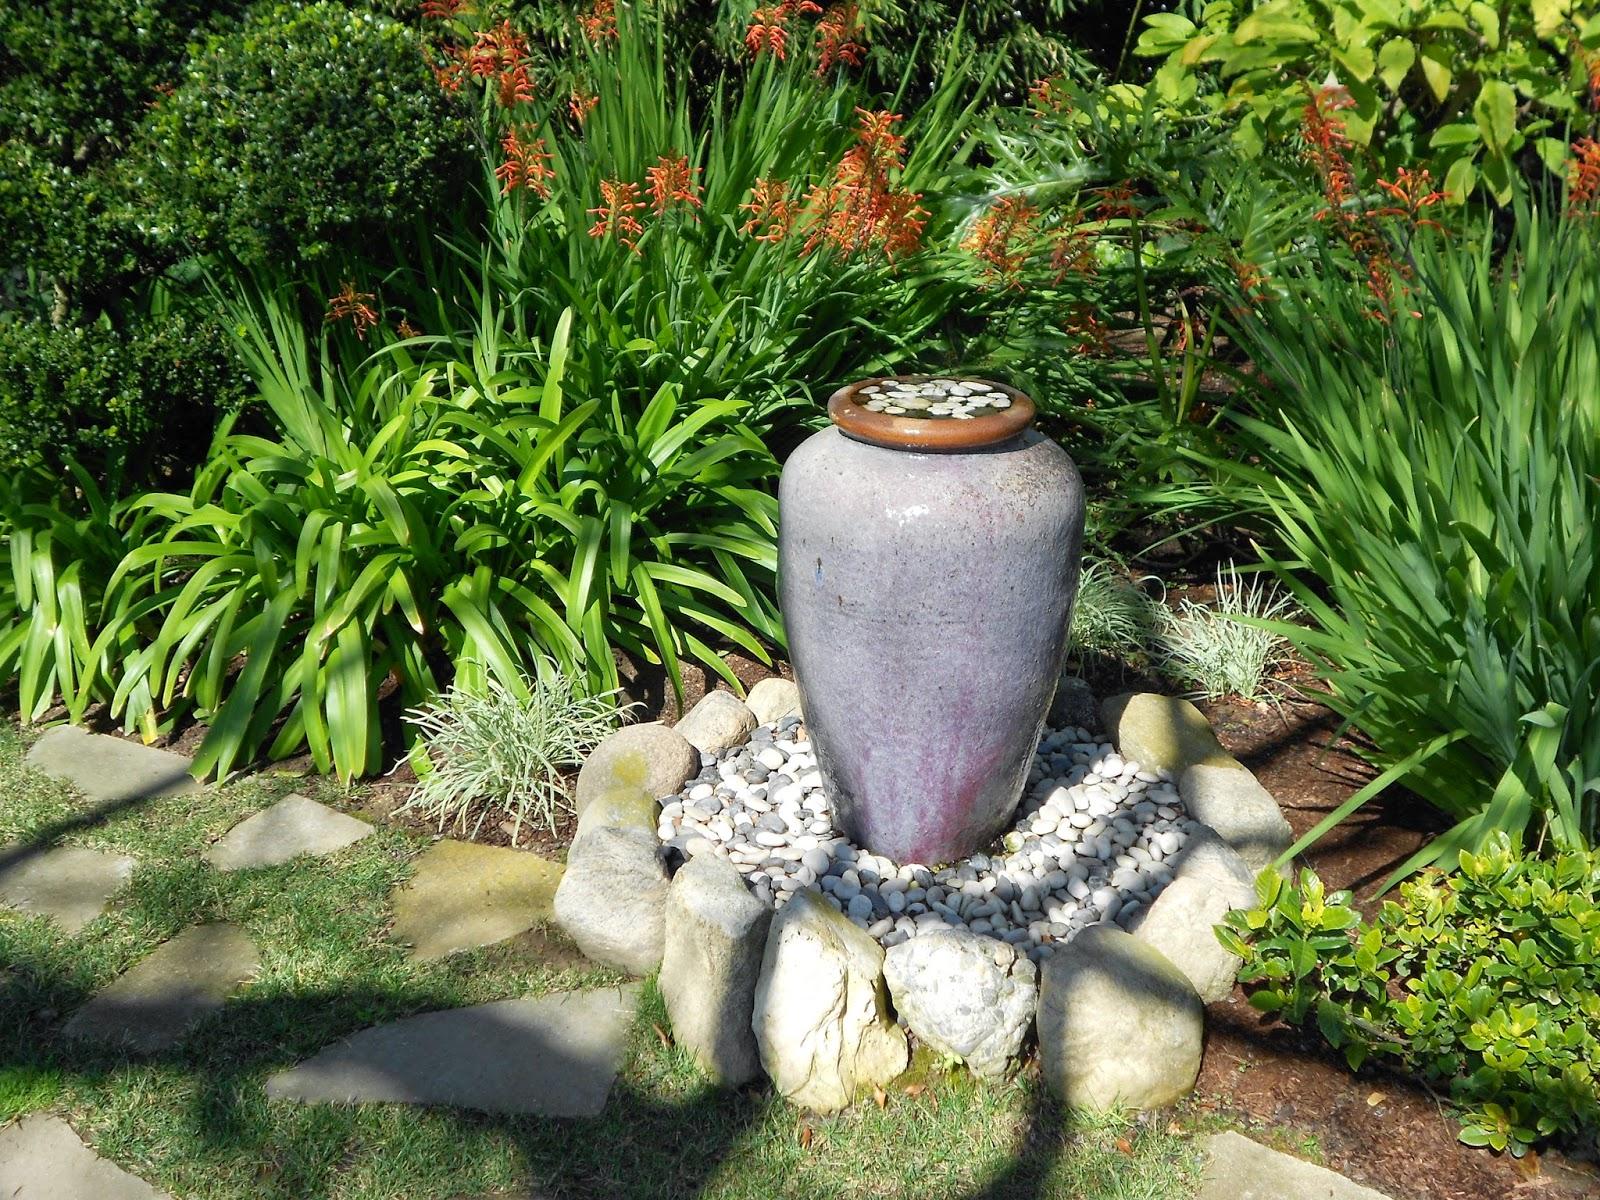 mar vista green garden showcase 3610 ocean view avenue cluster 2g